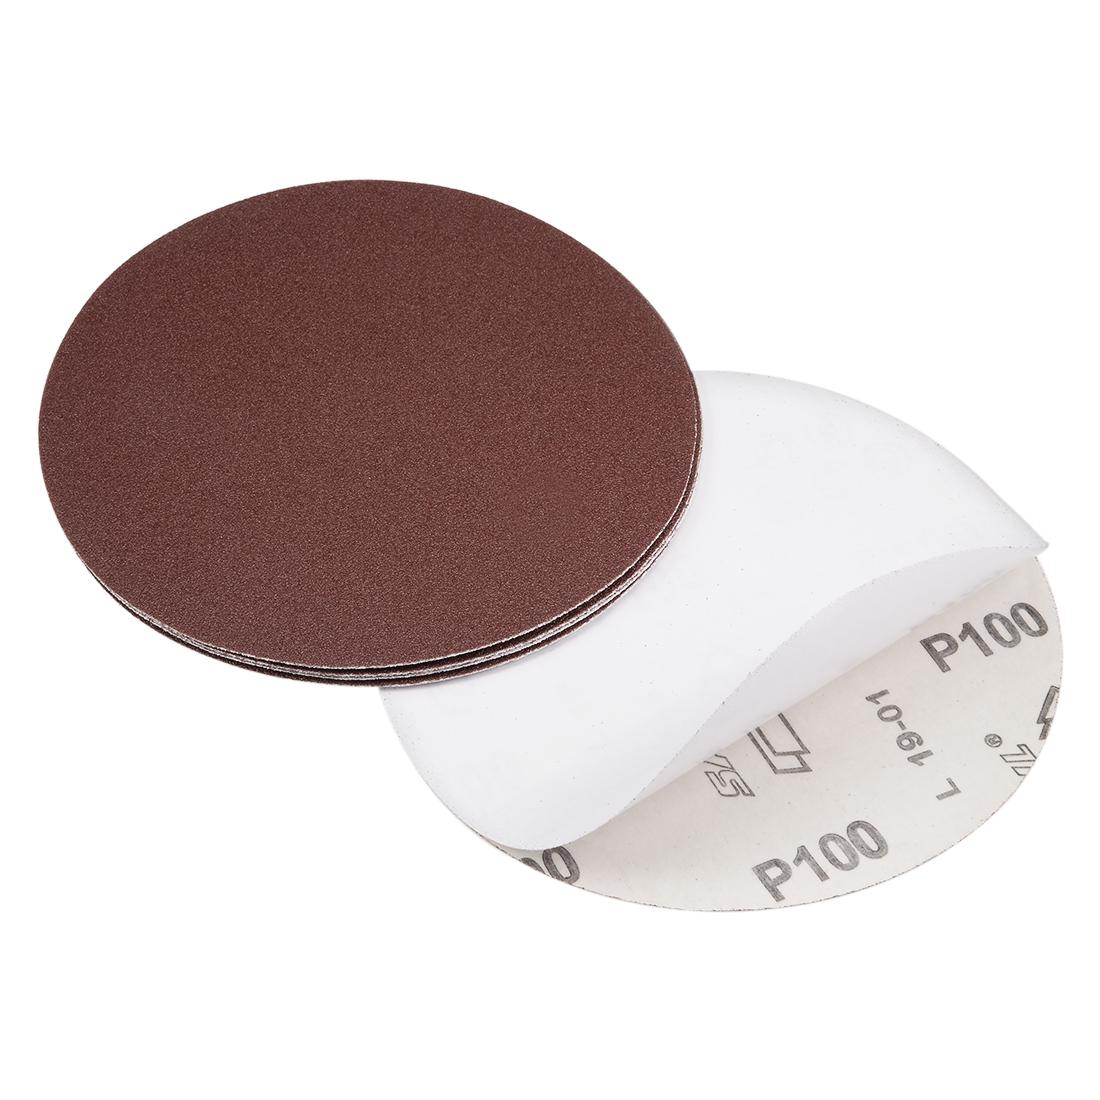 6-inch 100-Grits PSA Sanding Disc, Adhesive-Backed for Orbital Sander 5pcs